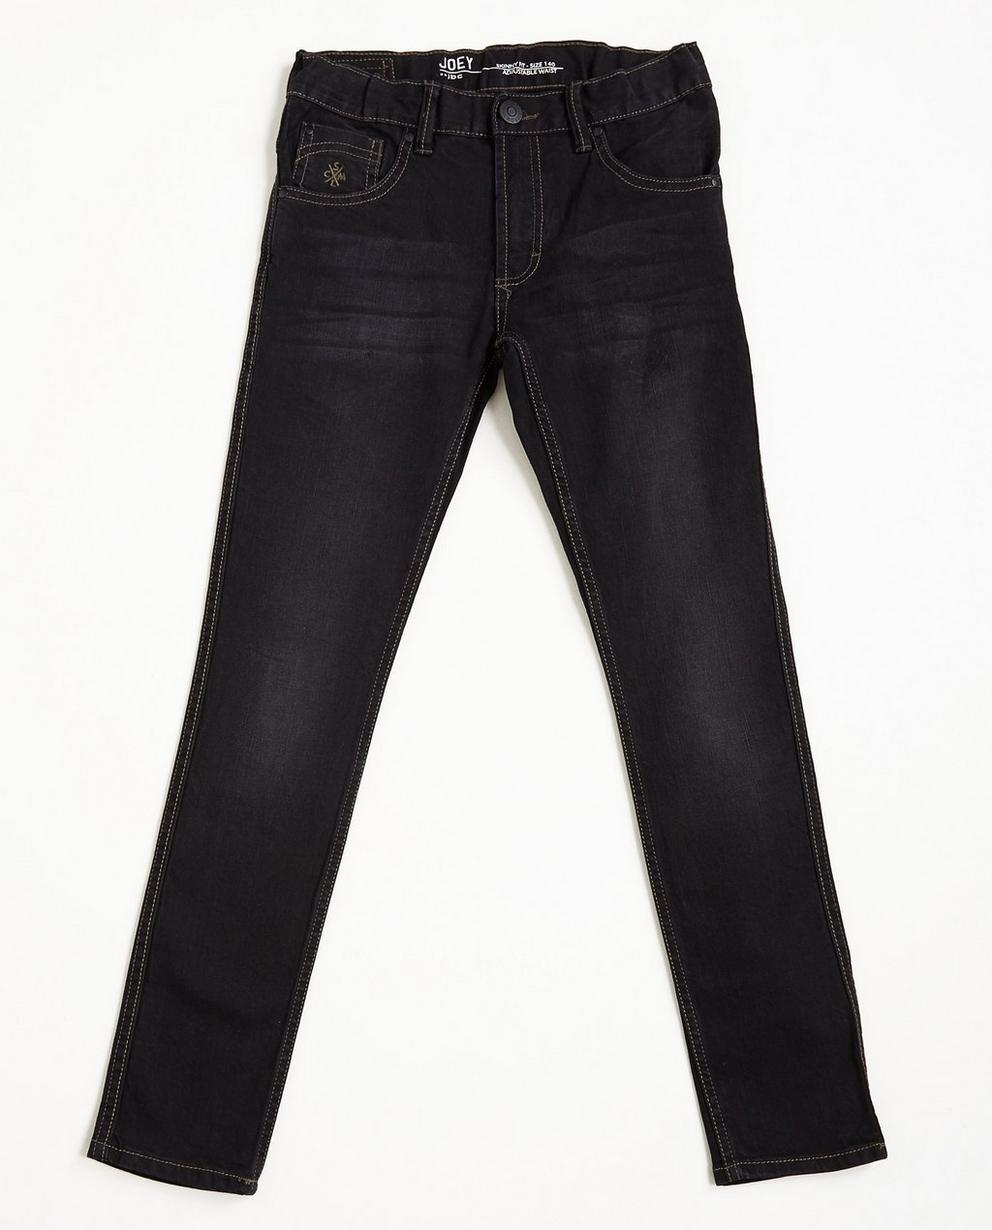 Nachtblaue Skinny-Jeans - Dry Denim - JBC